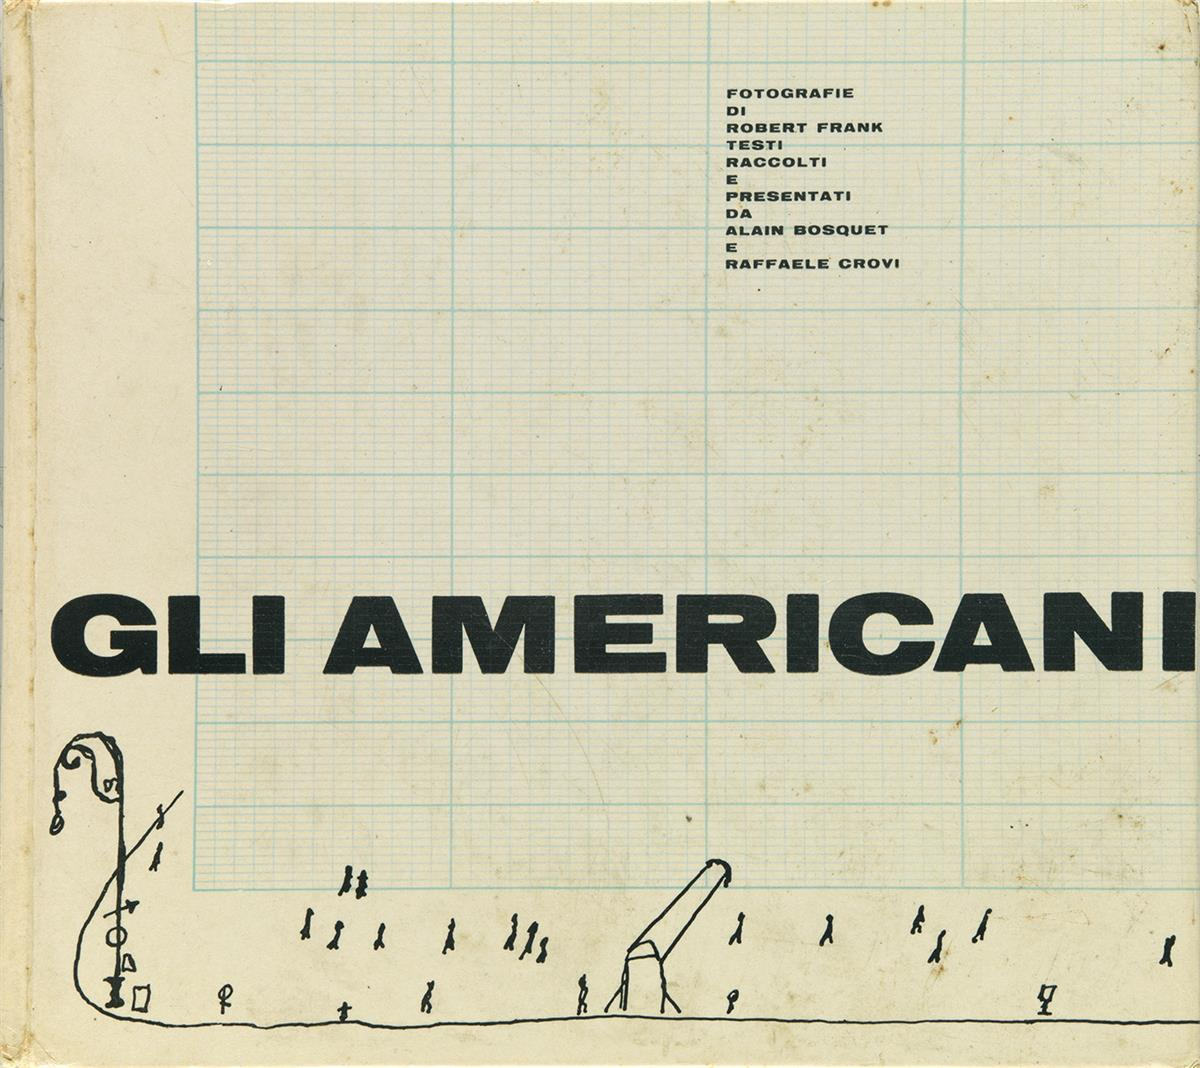 ROBERT-FRANK-Gli-Americani-[The-Americans]